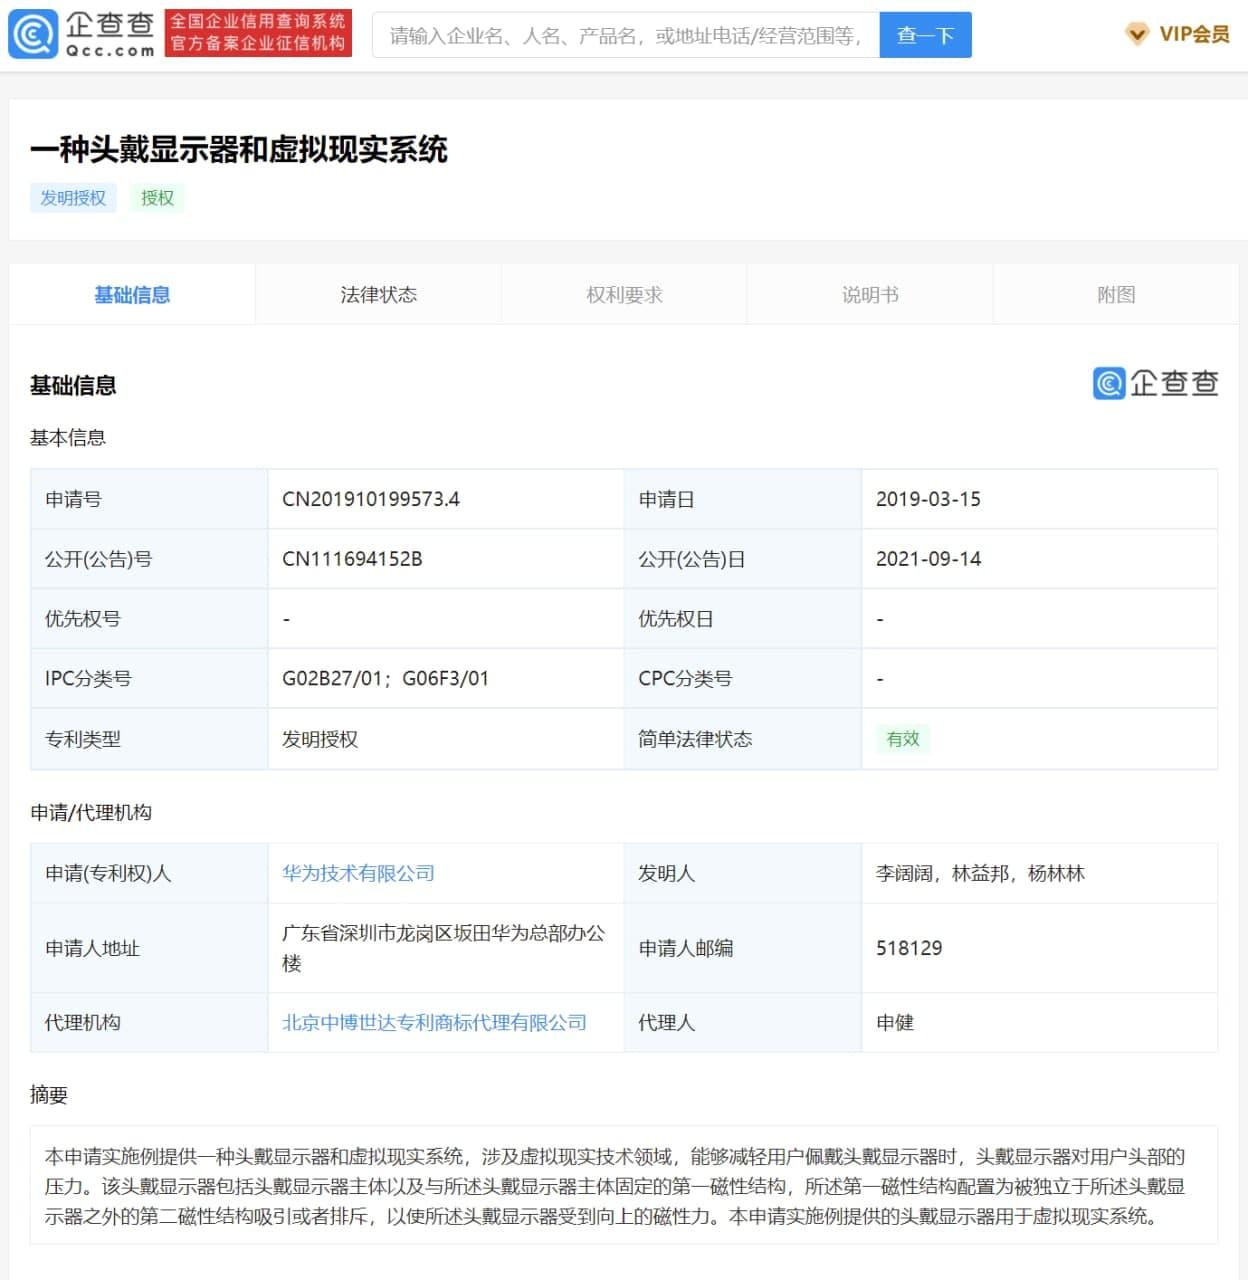 Huawei VR Technology Patent